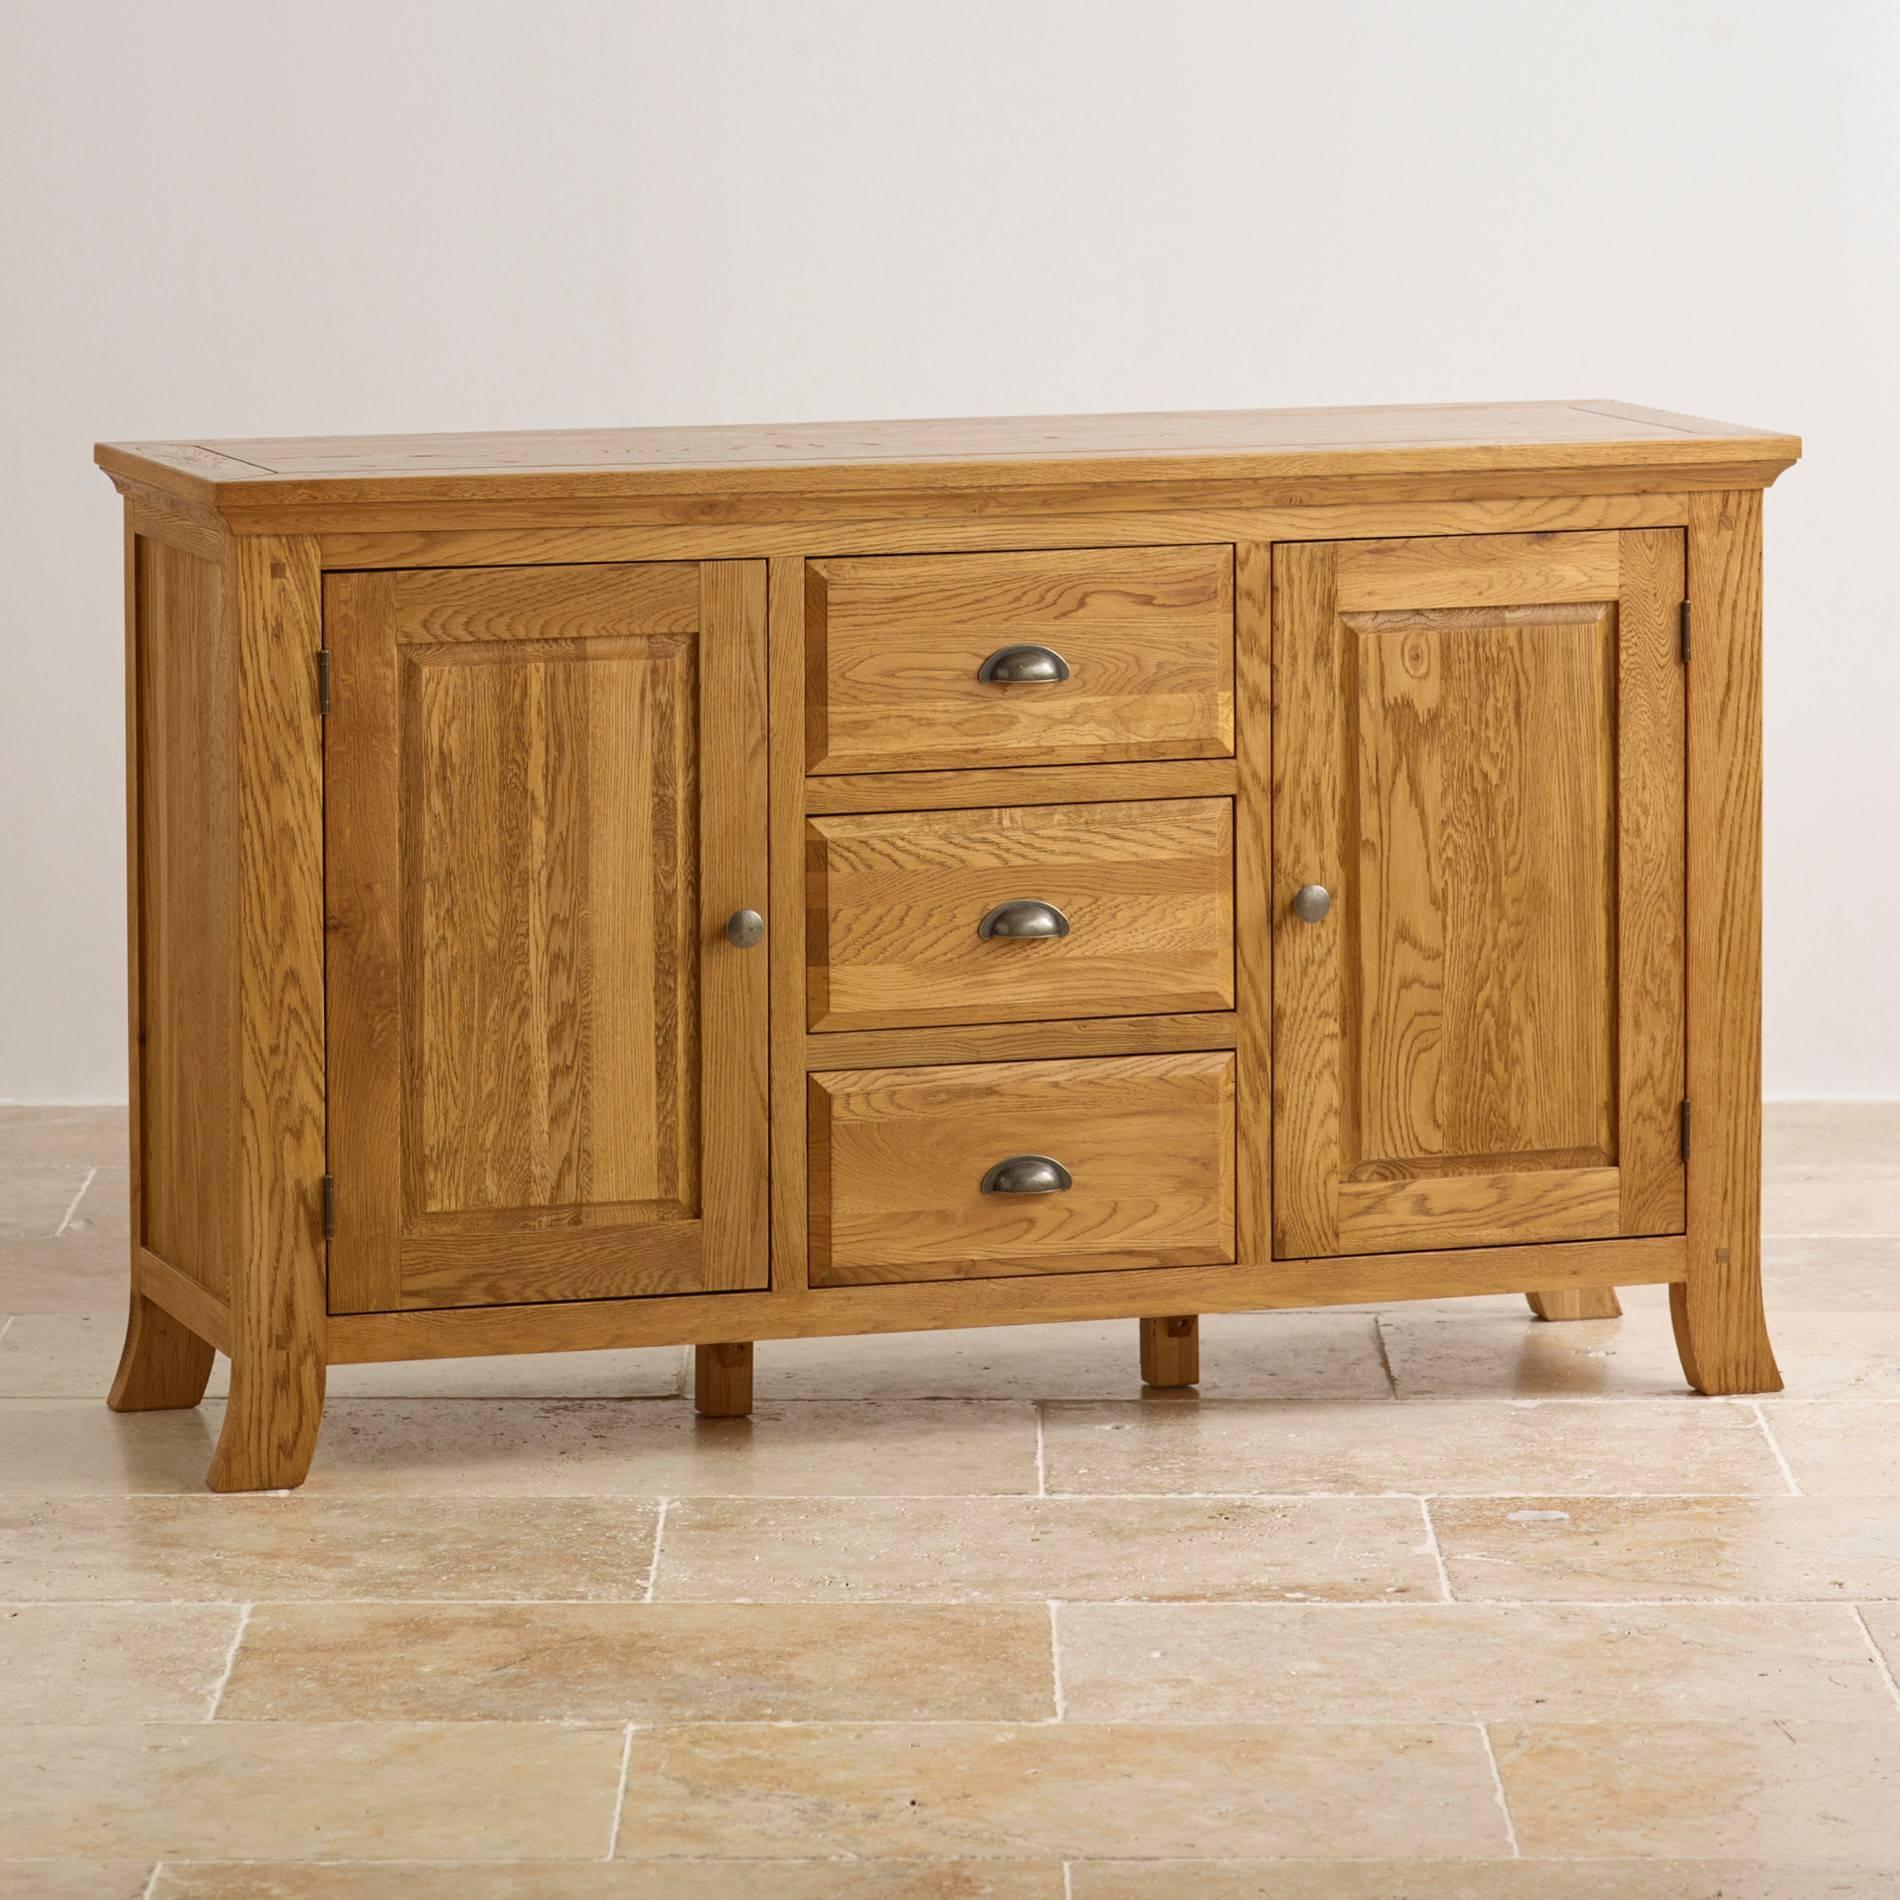 Taunton Large Sideboard In Rustic Solid Oak | Oak Furniture Land Within Oak Sideboards (#17 of 20)